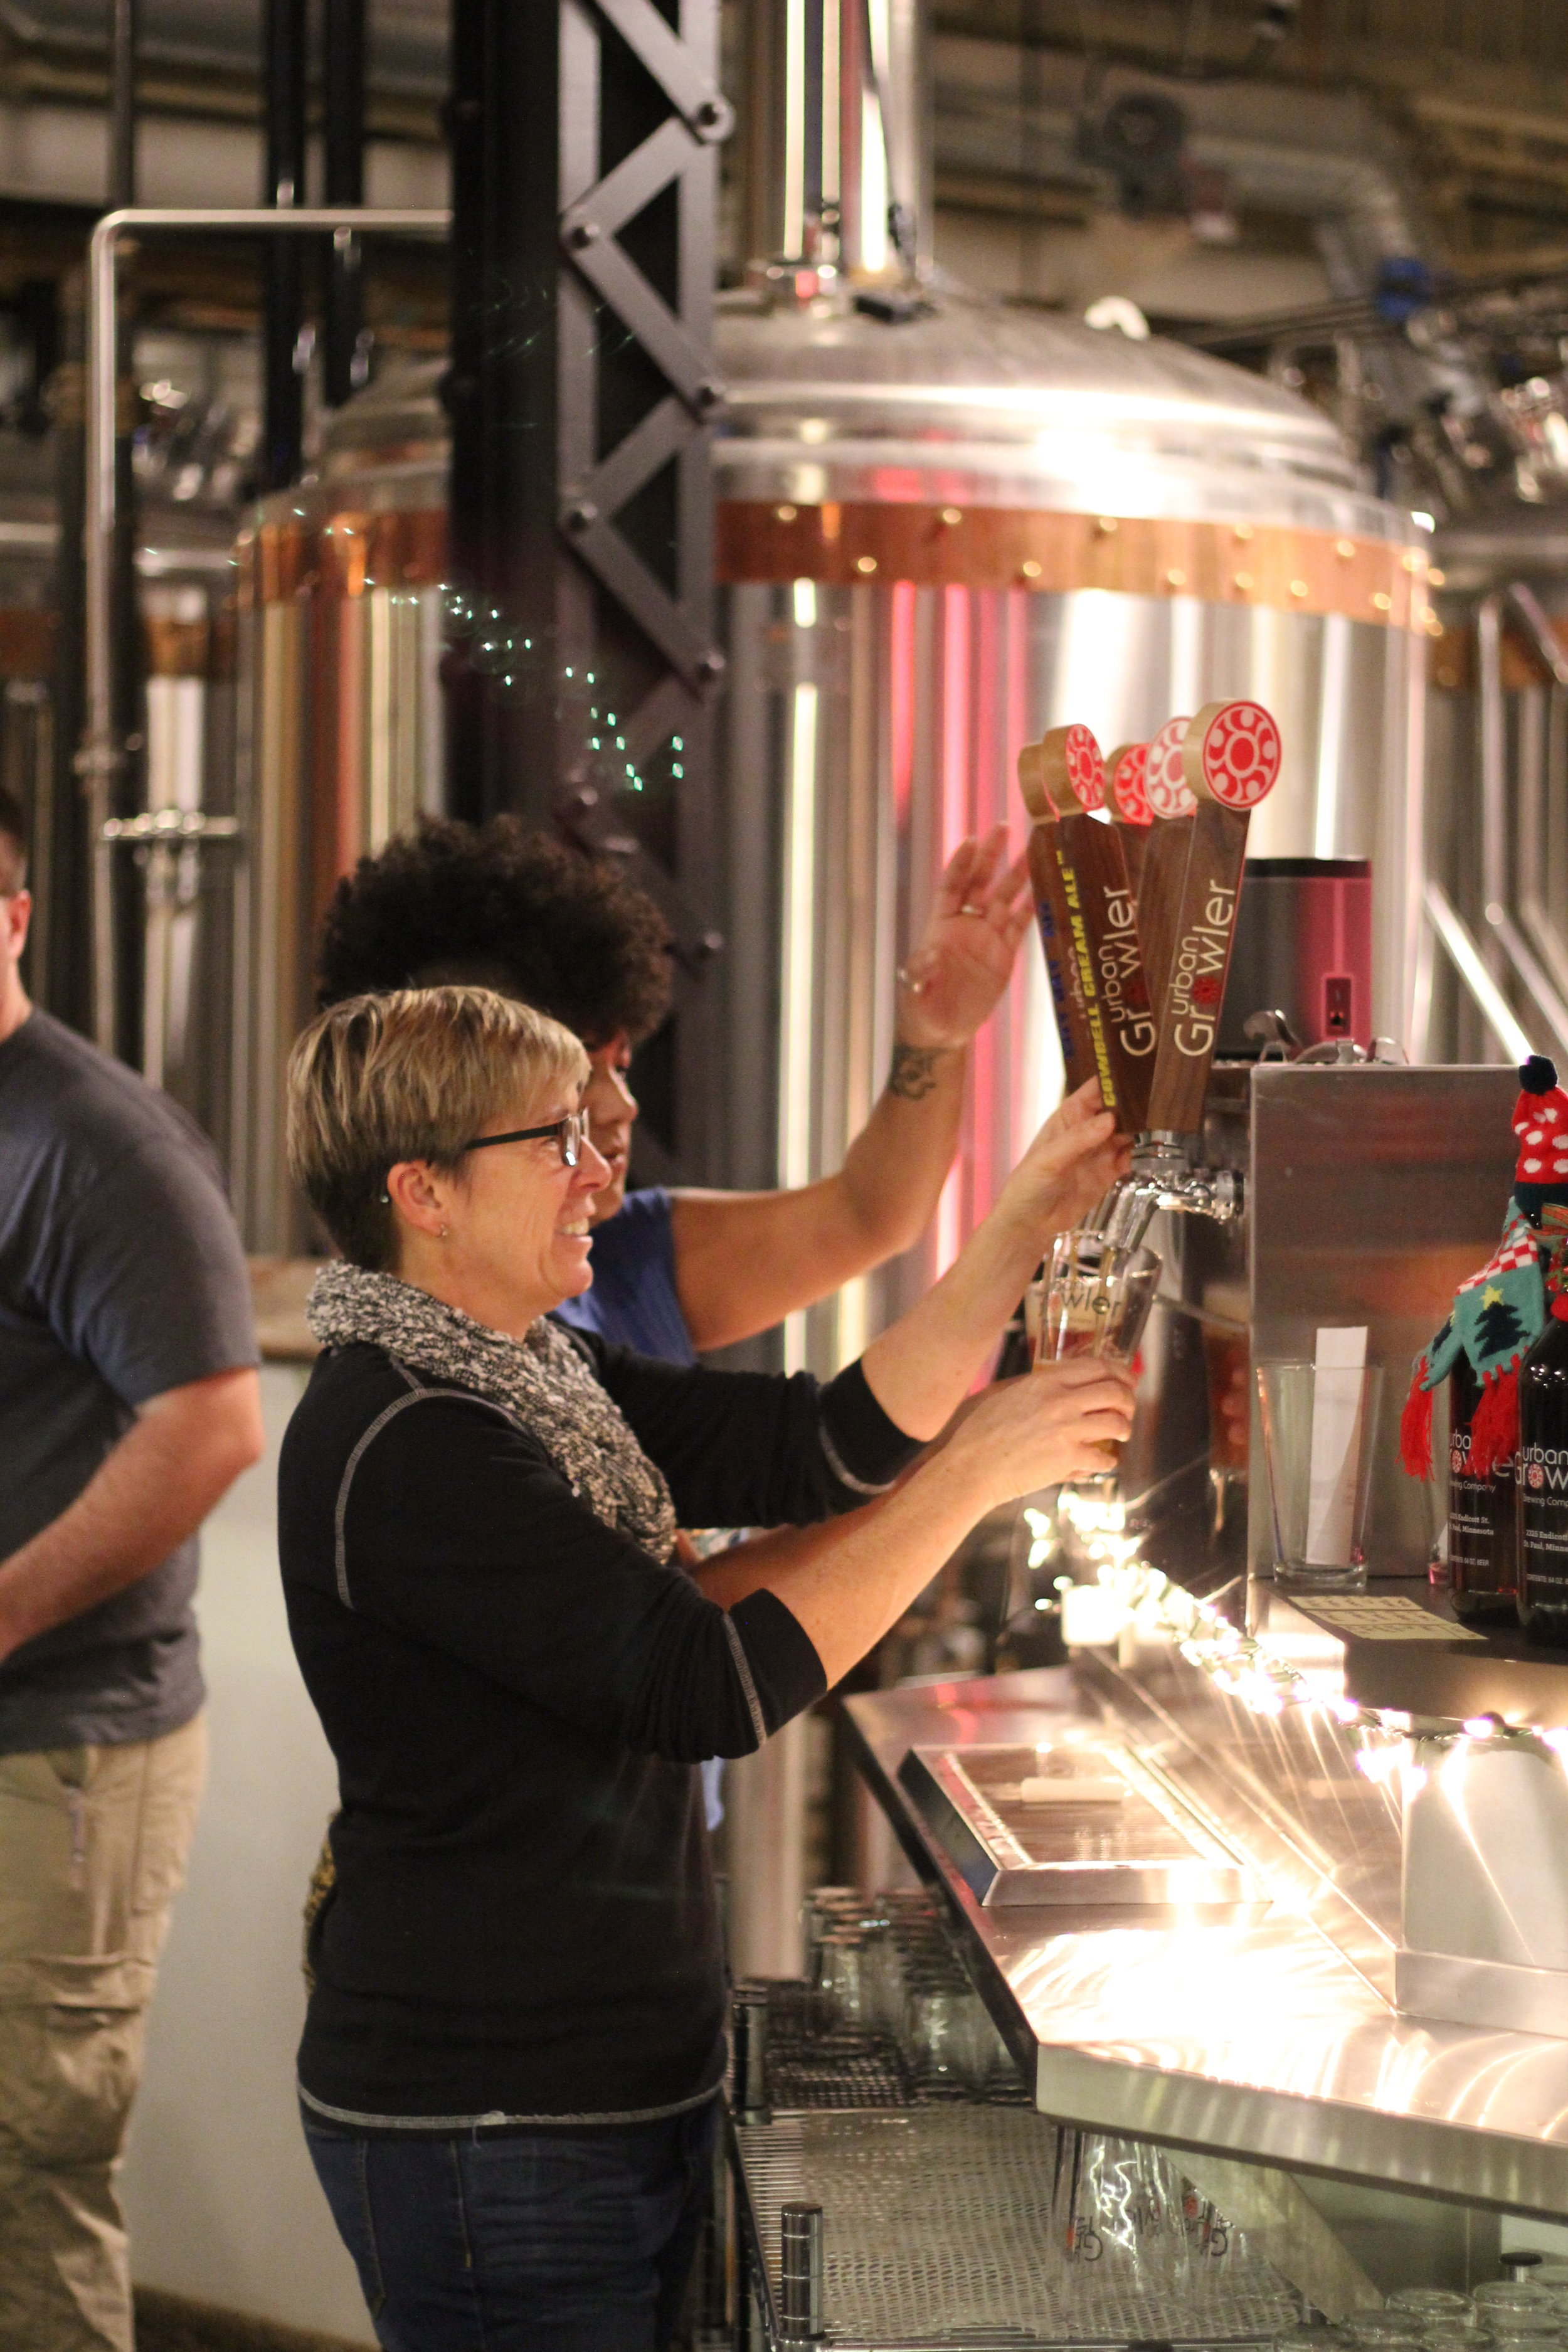 Jill Pavlak, co-owner of Urban Growler, pouring a Cream Ale